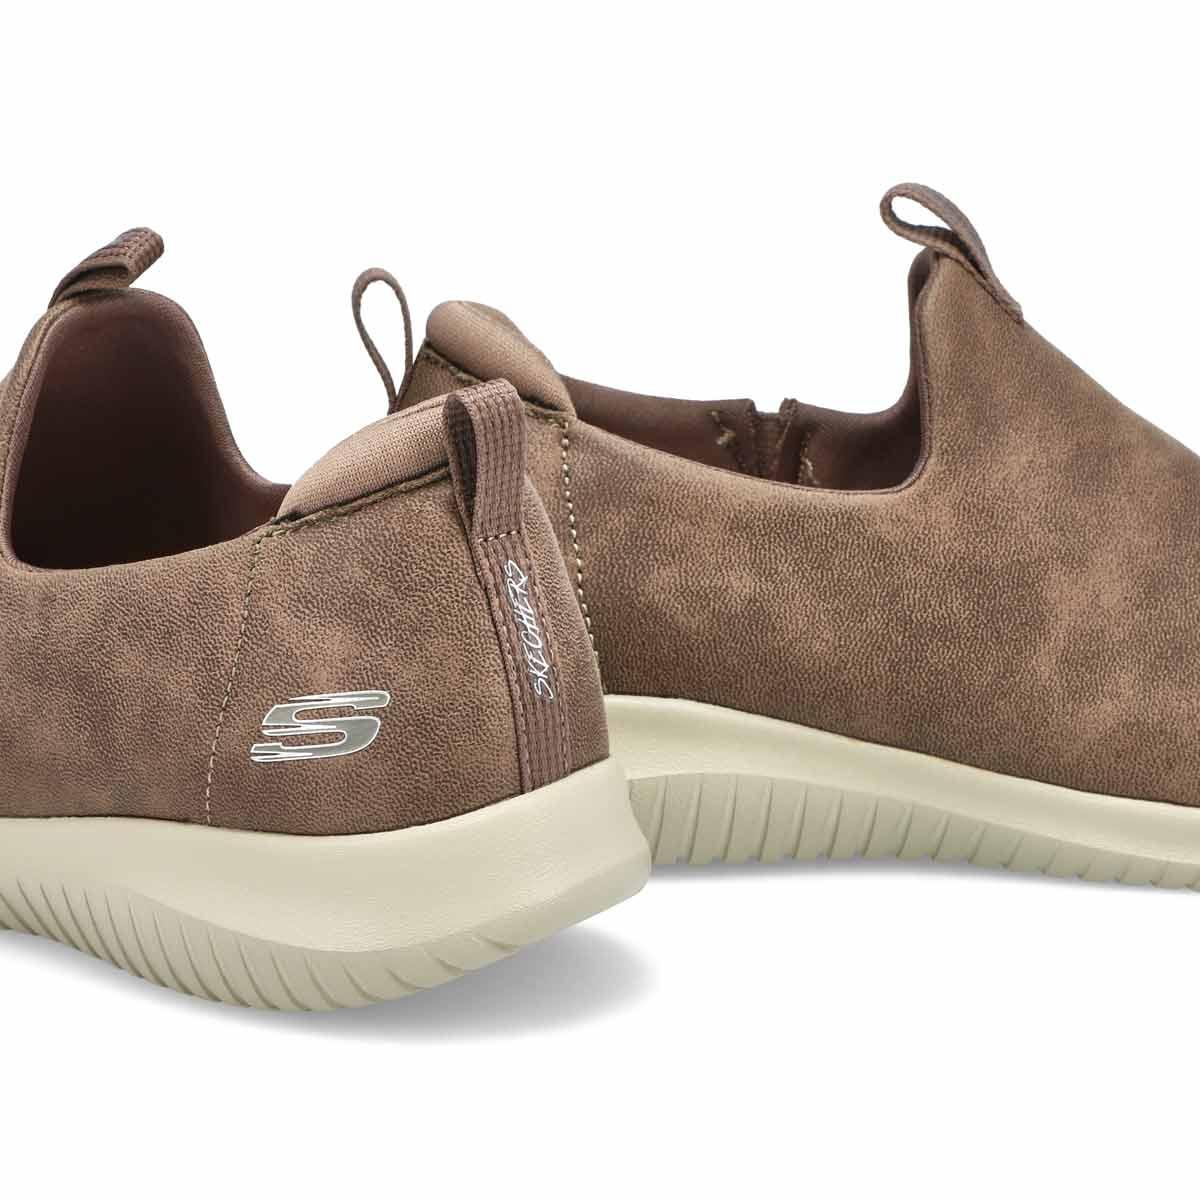 Chaussure Ultra Flex, taupe foncé, femme